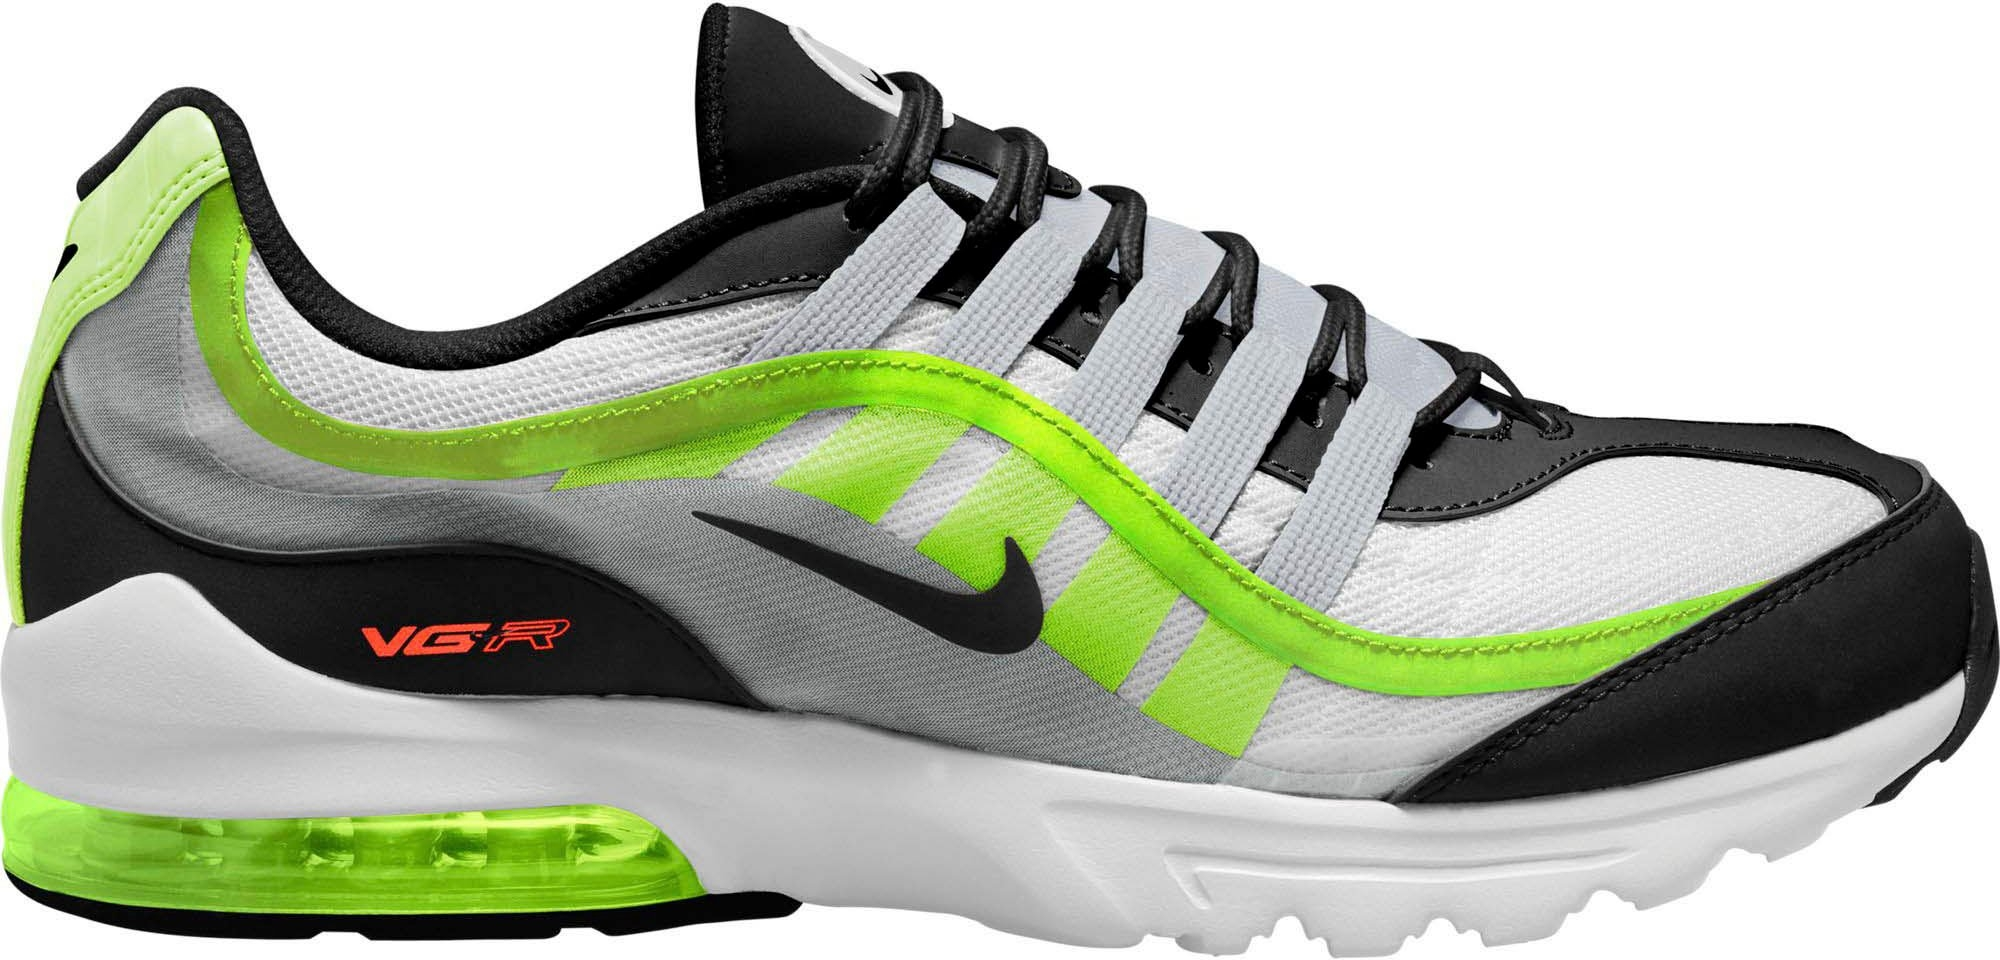 Nike Sportswear Nike sneakers »Air Max VG-R« - verschillende betaalmethodes